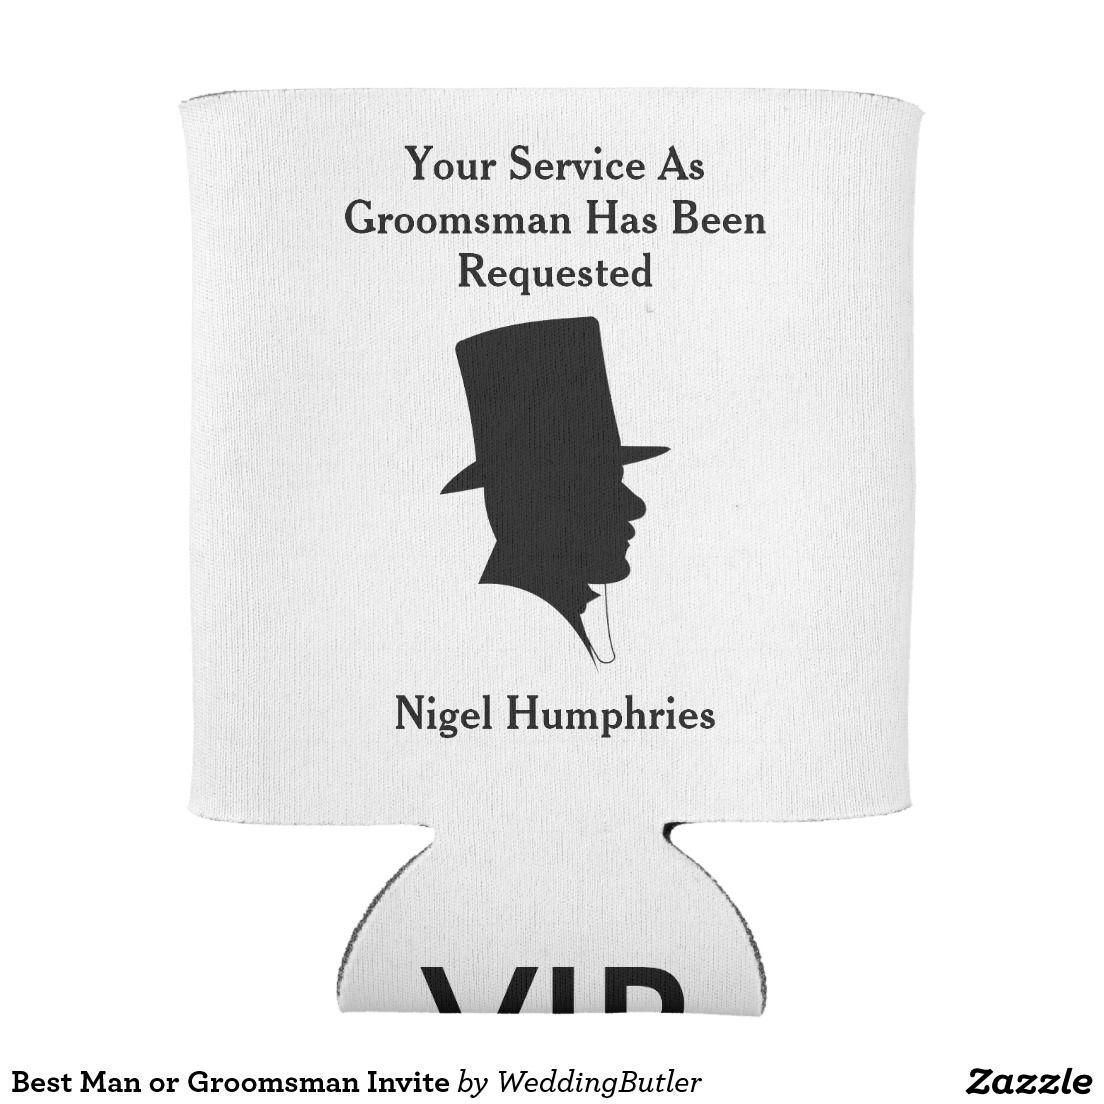 Best Man or Groomsman Invite Can Cooler.  Purchase at zazzle.com/weddingbutler* #WeddingButler #WeddingGroomsmanInvite